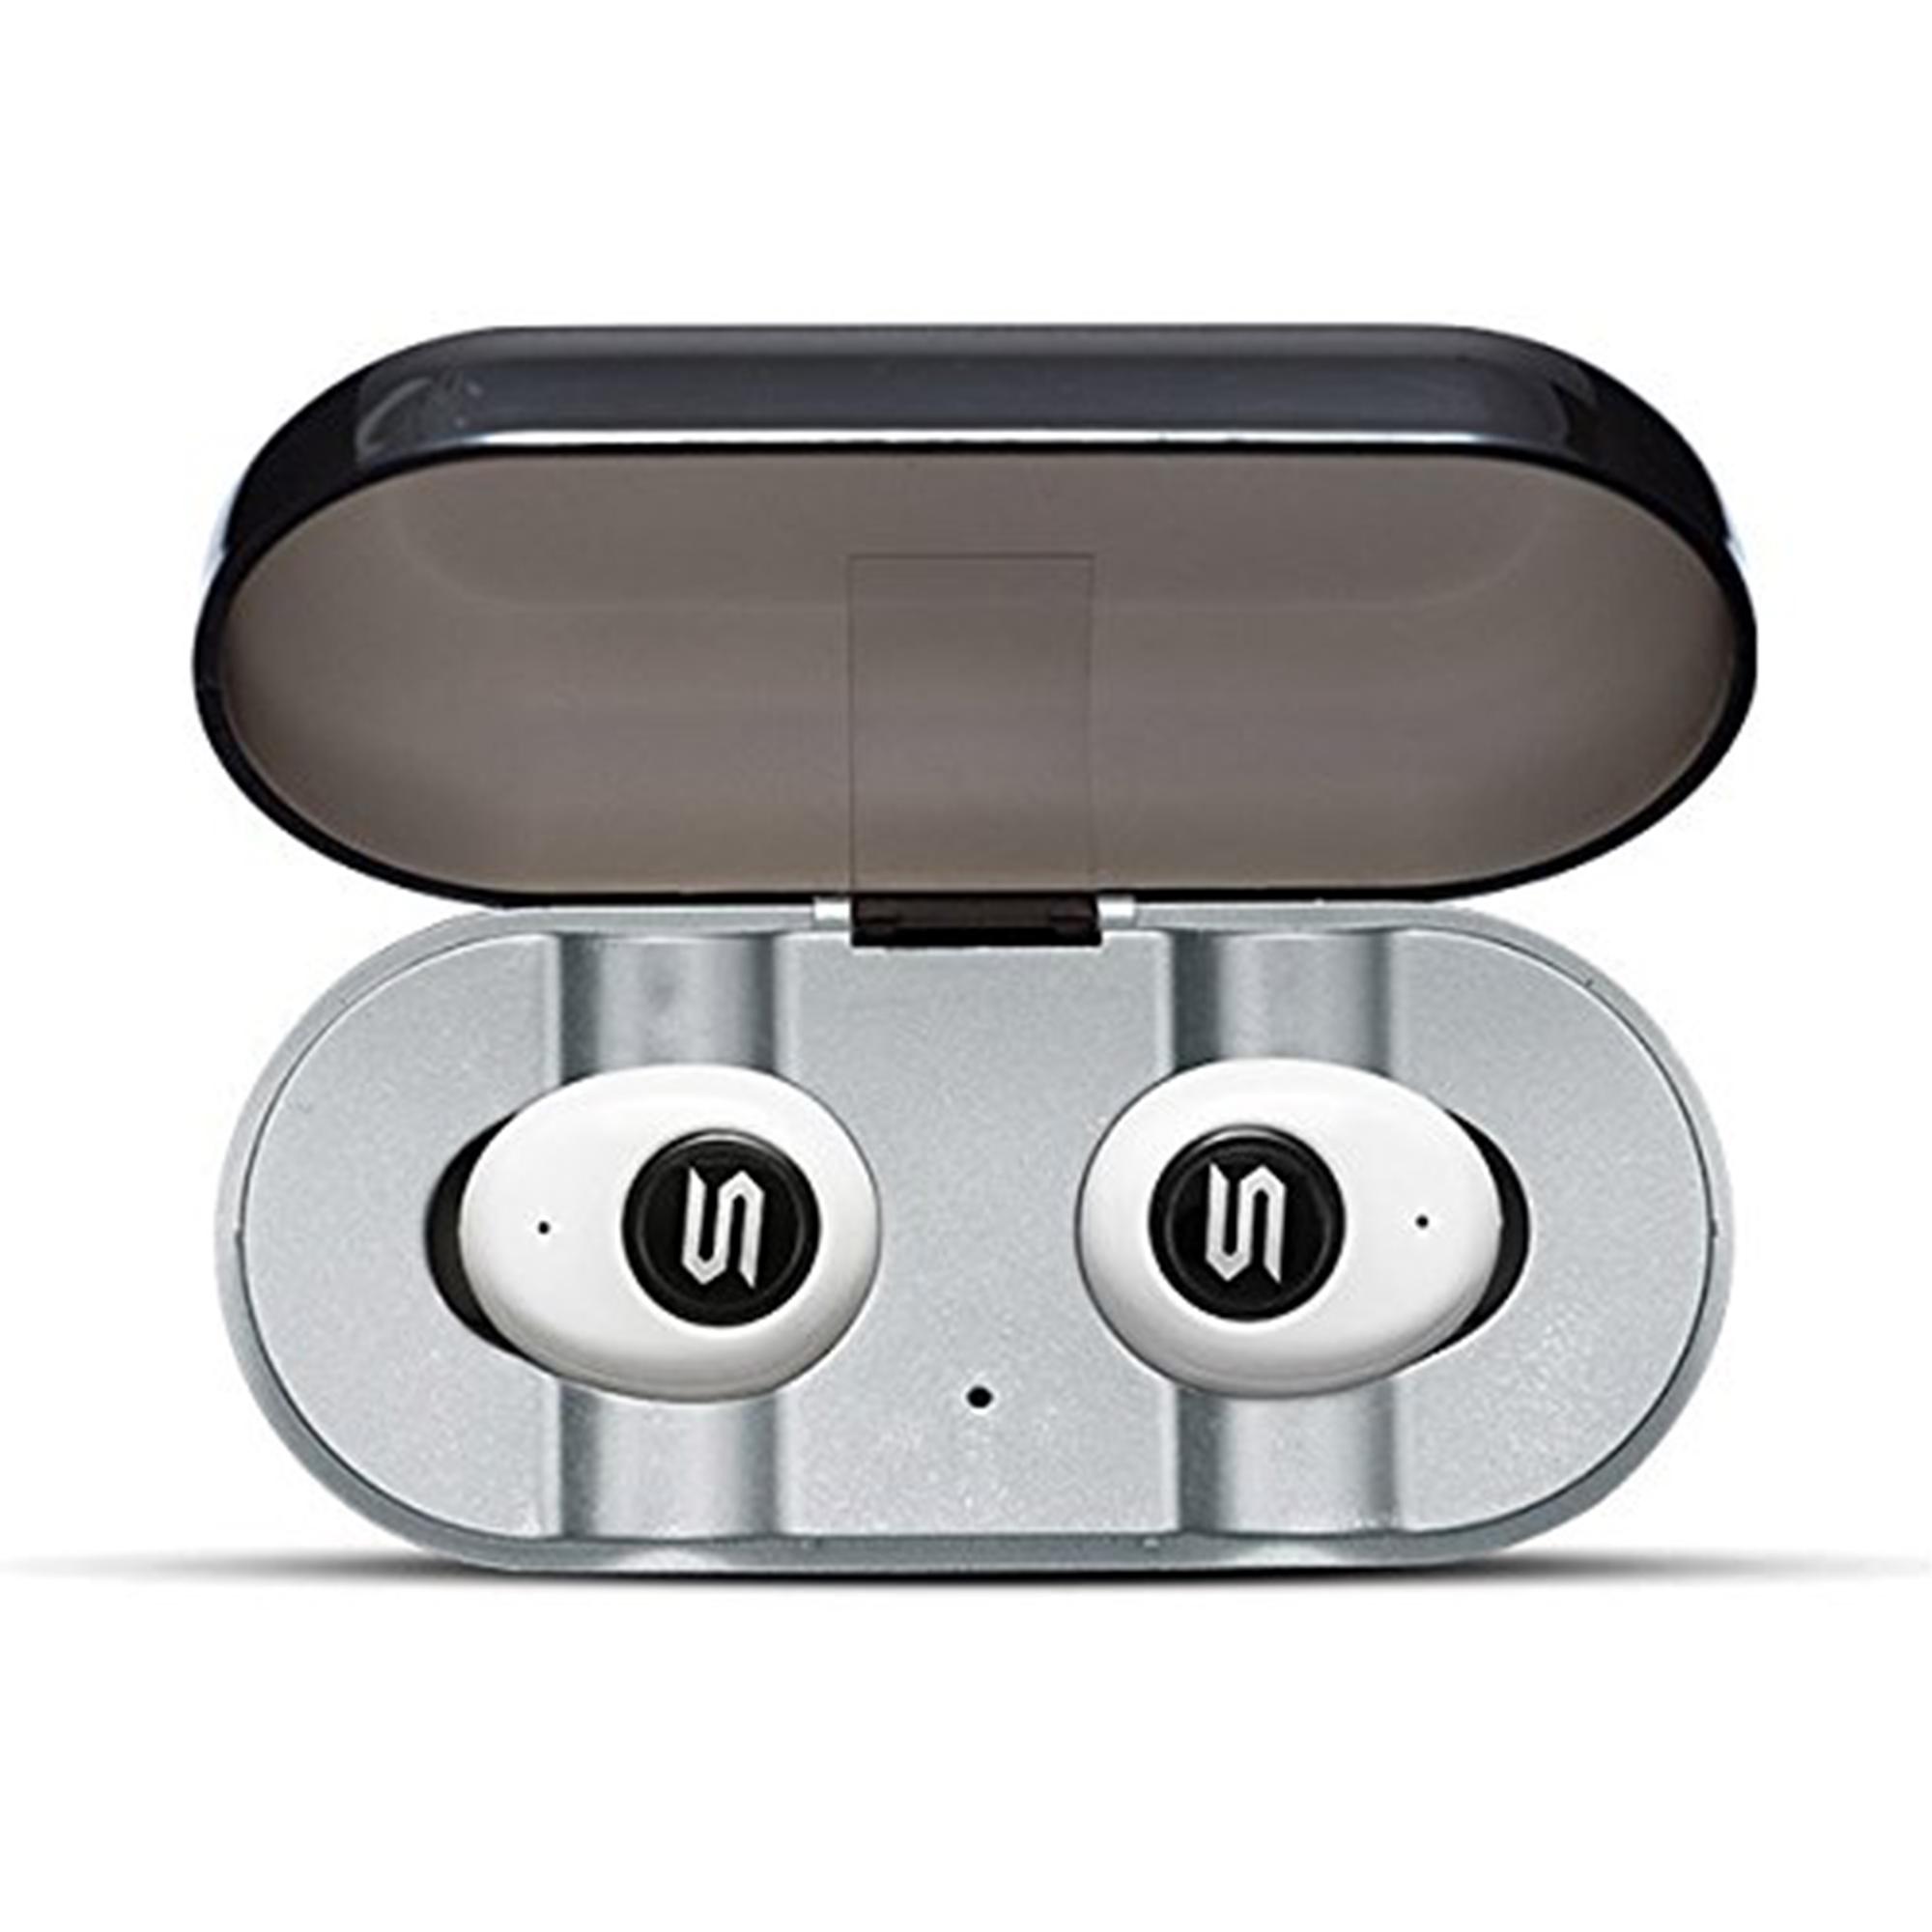 d6c9fd6c2d4 Superior High Performance True Wireless Earphones (ST-XS). Accessories  Headphones and Speakers